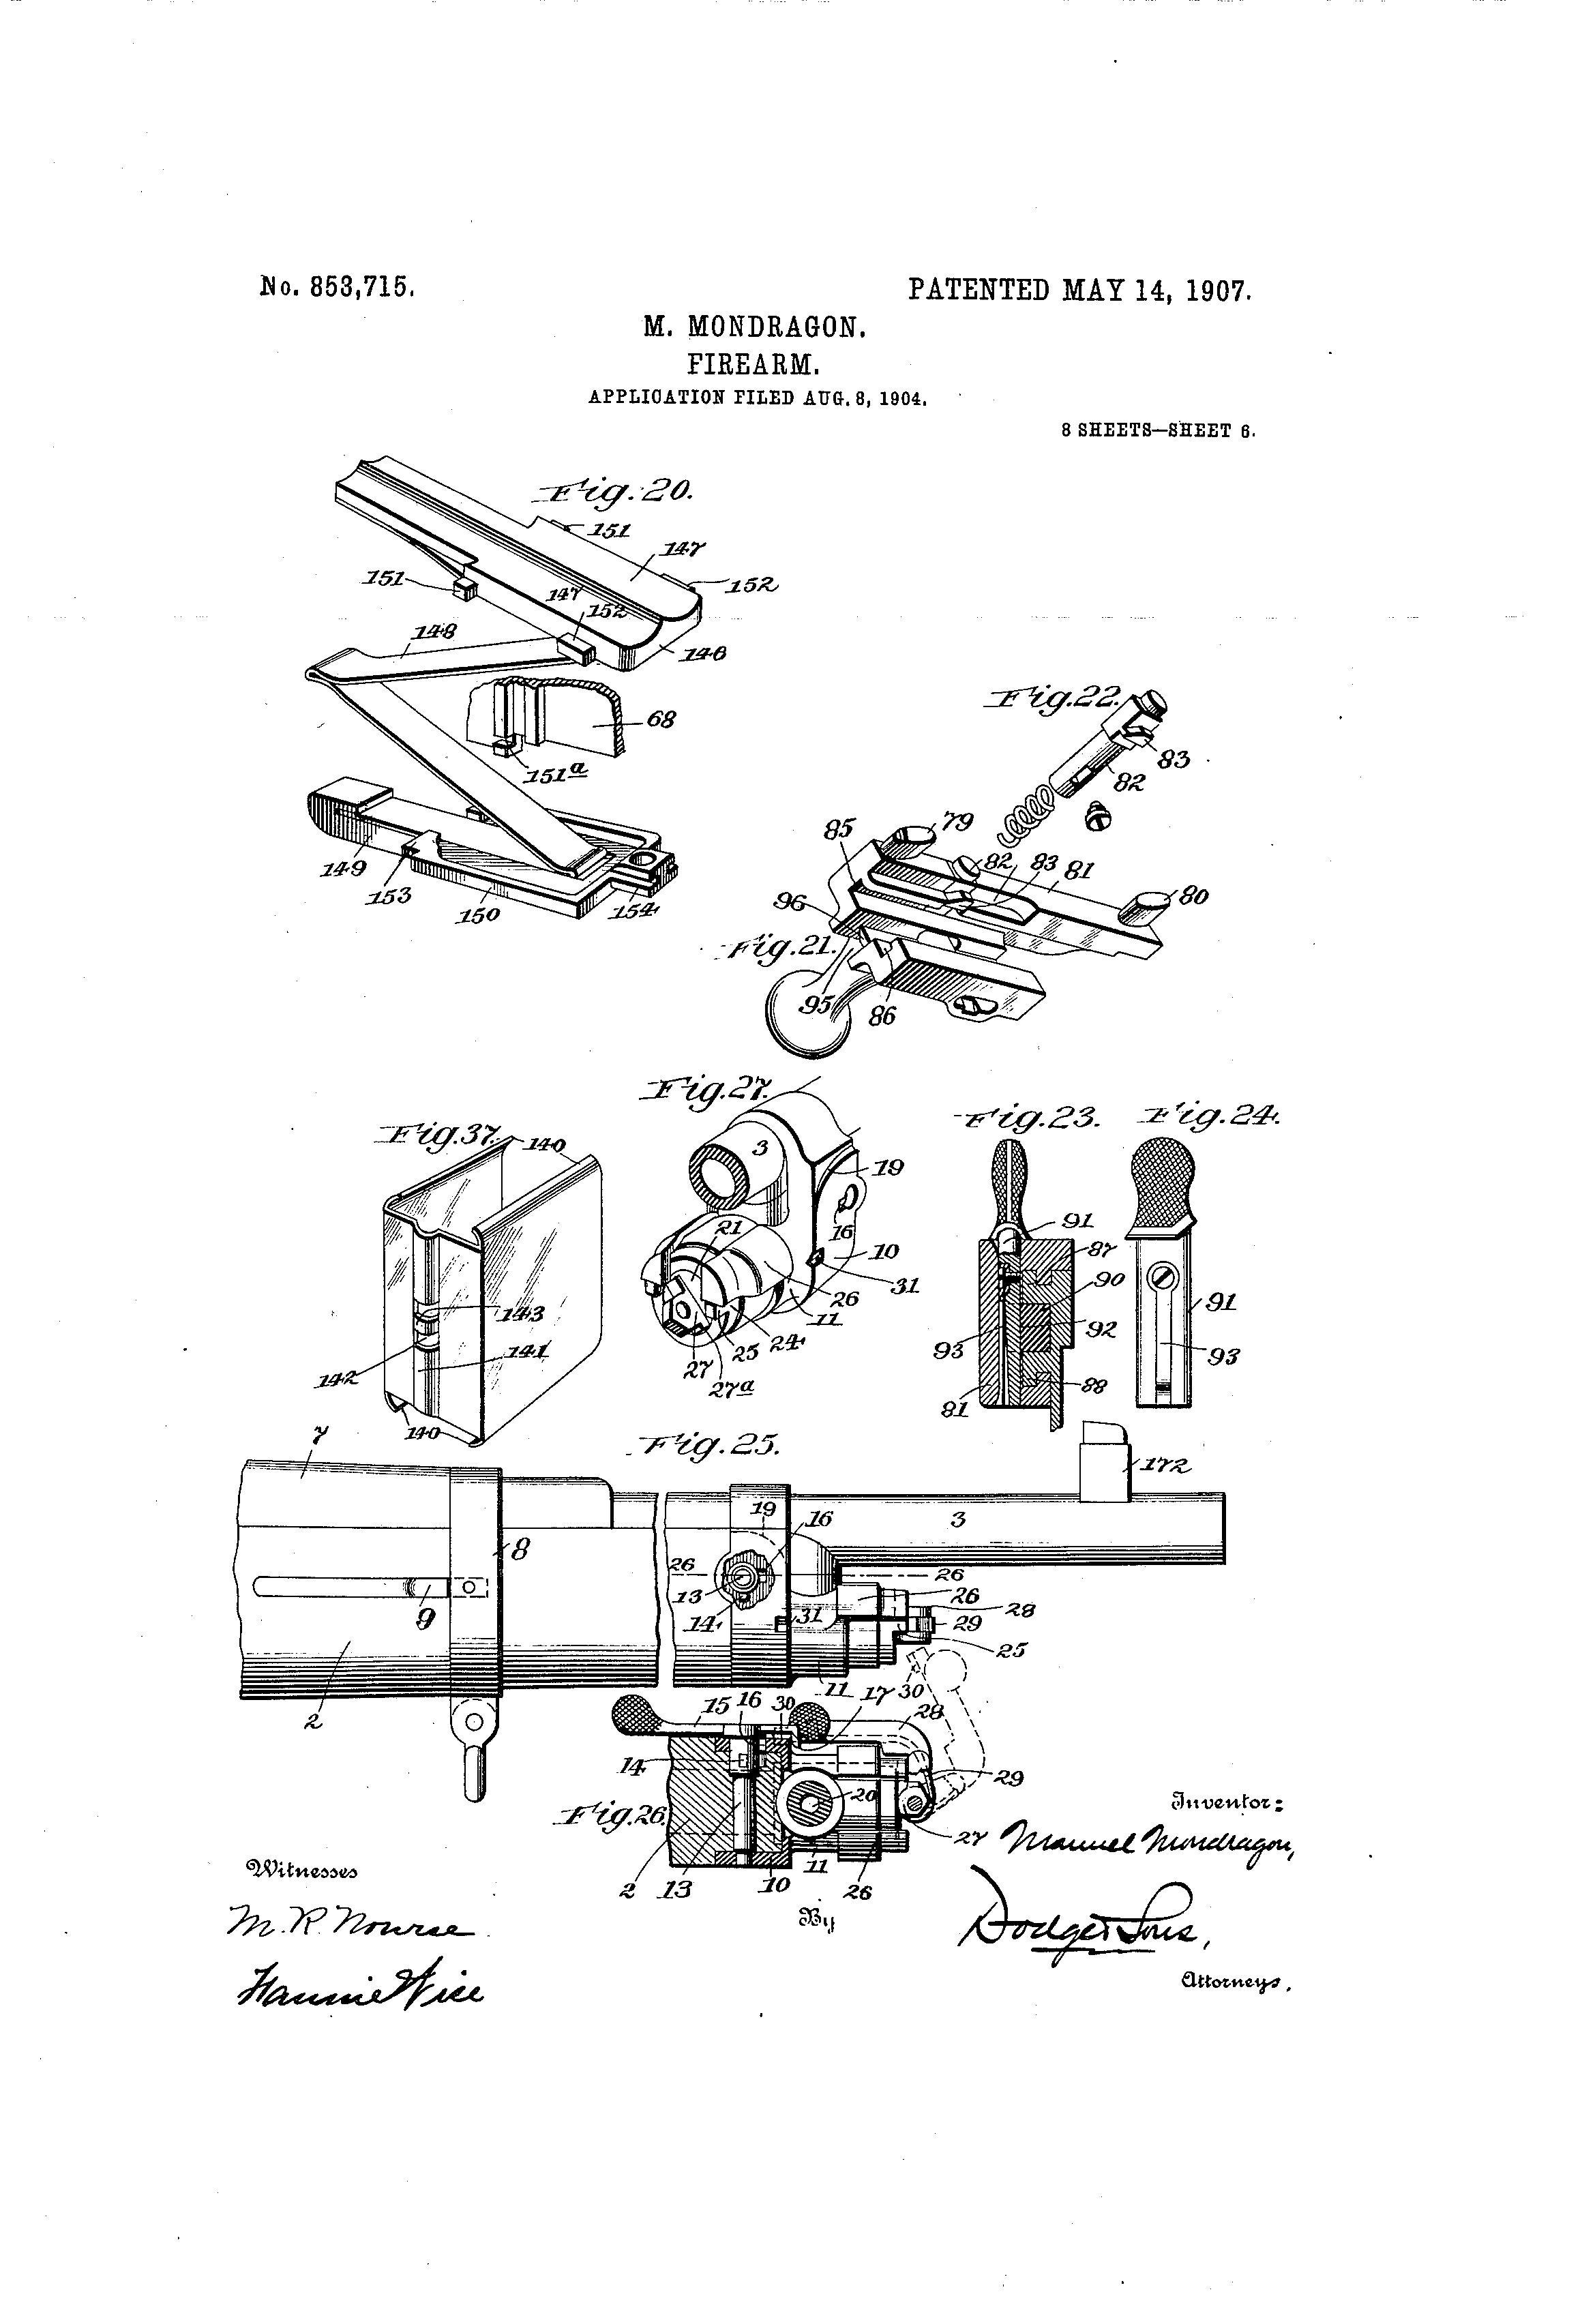 File 006 Mondragon Patent Rifle